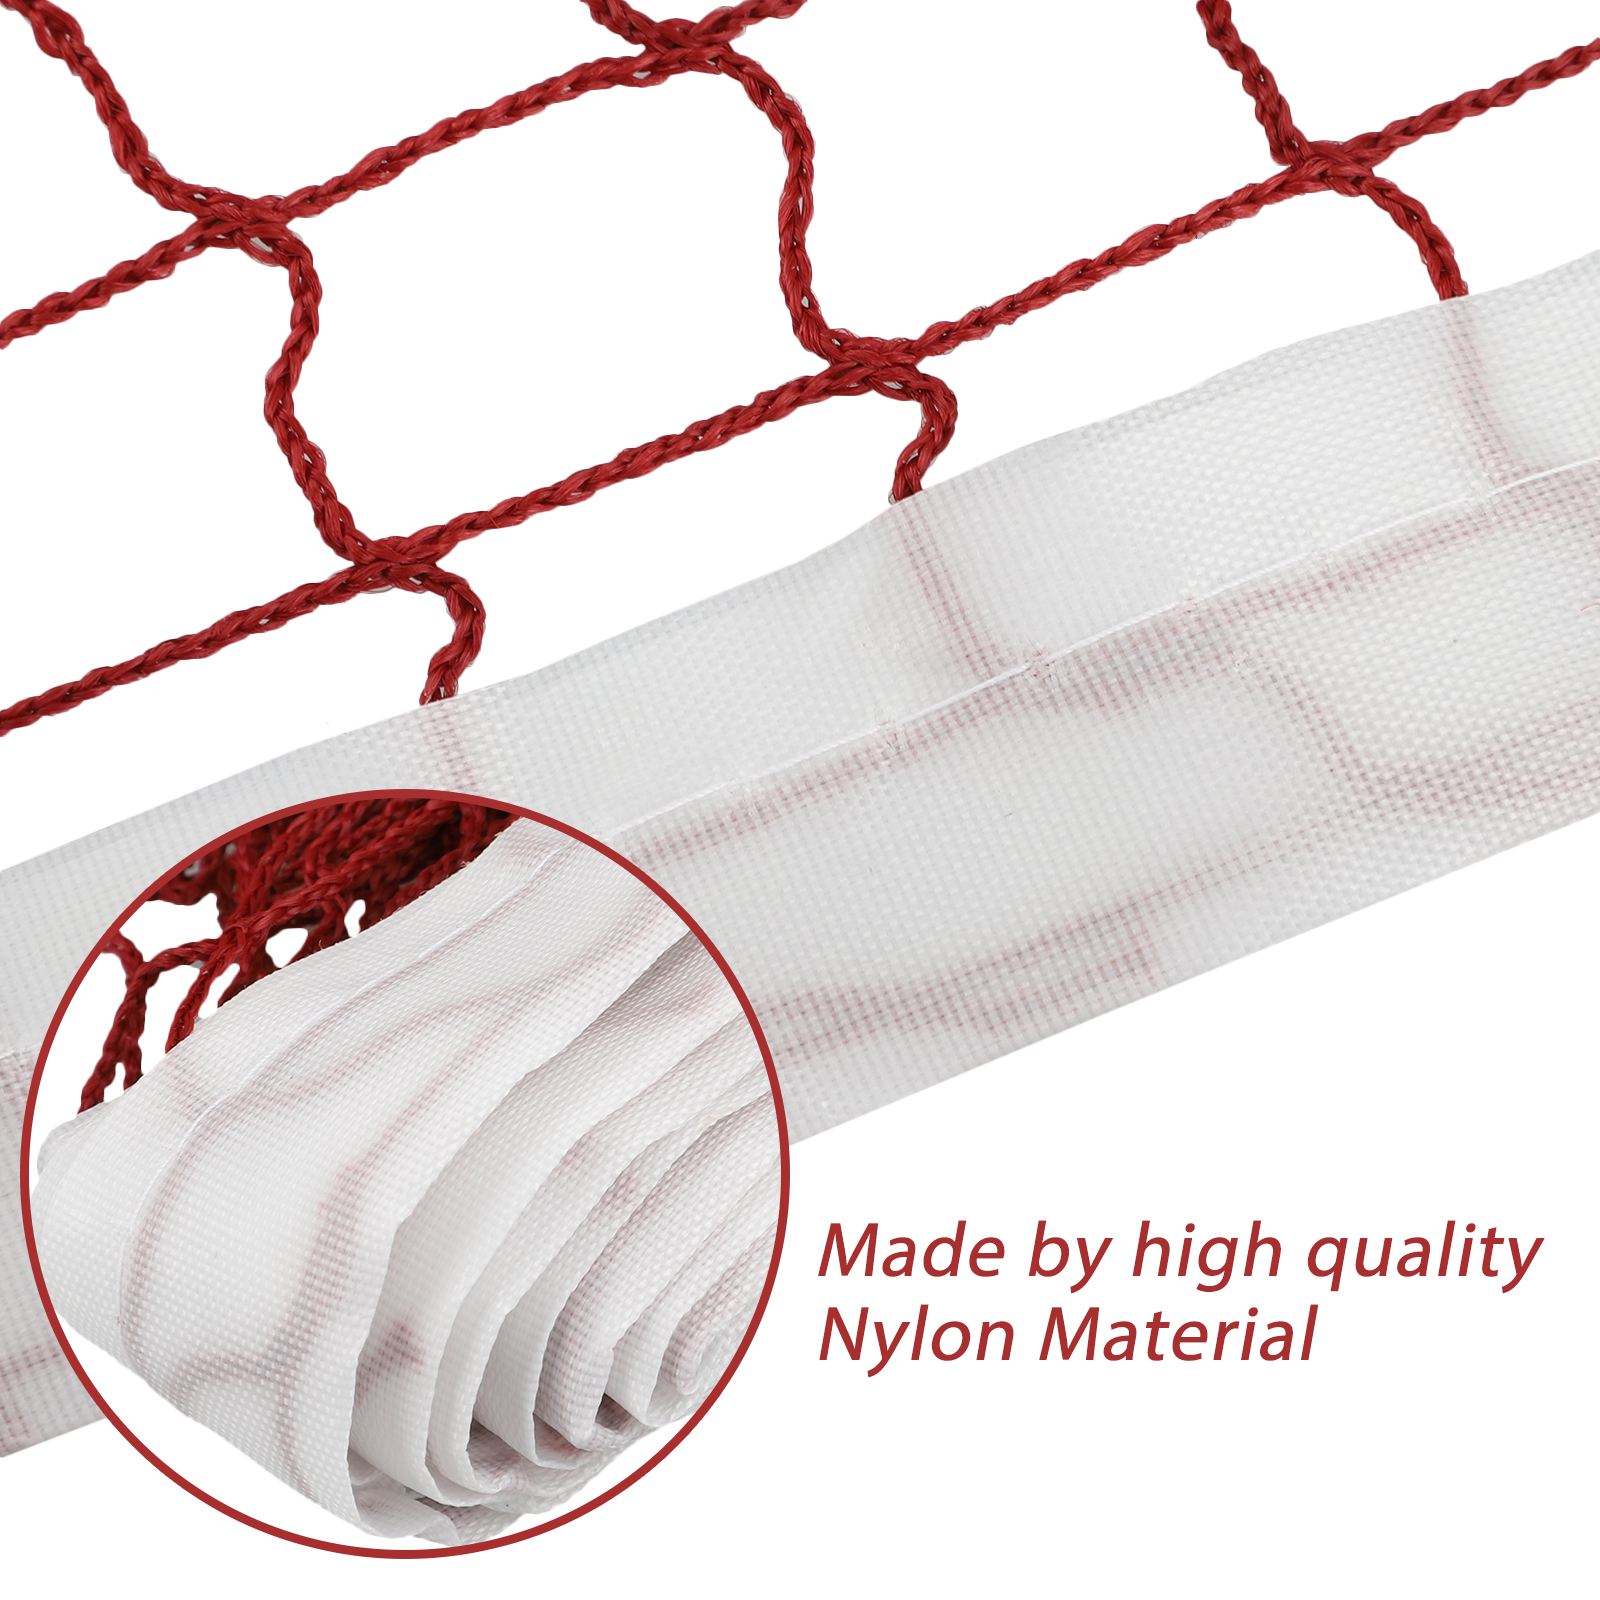 Red-Badminton-Tennis-Volleyball-Net-For-Beach-Garden-Indoor-Outdoor-Games-Sport thumbnail 4